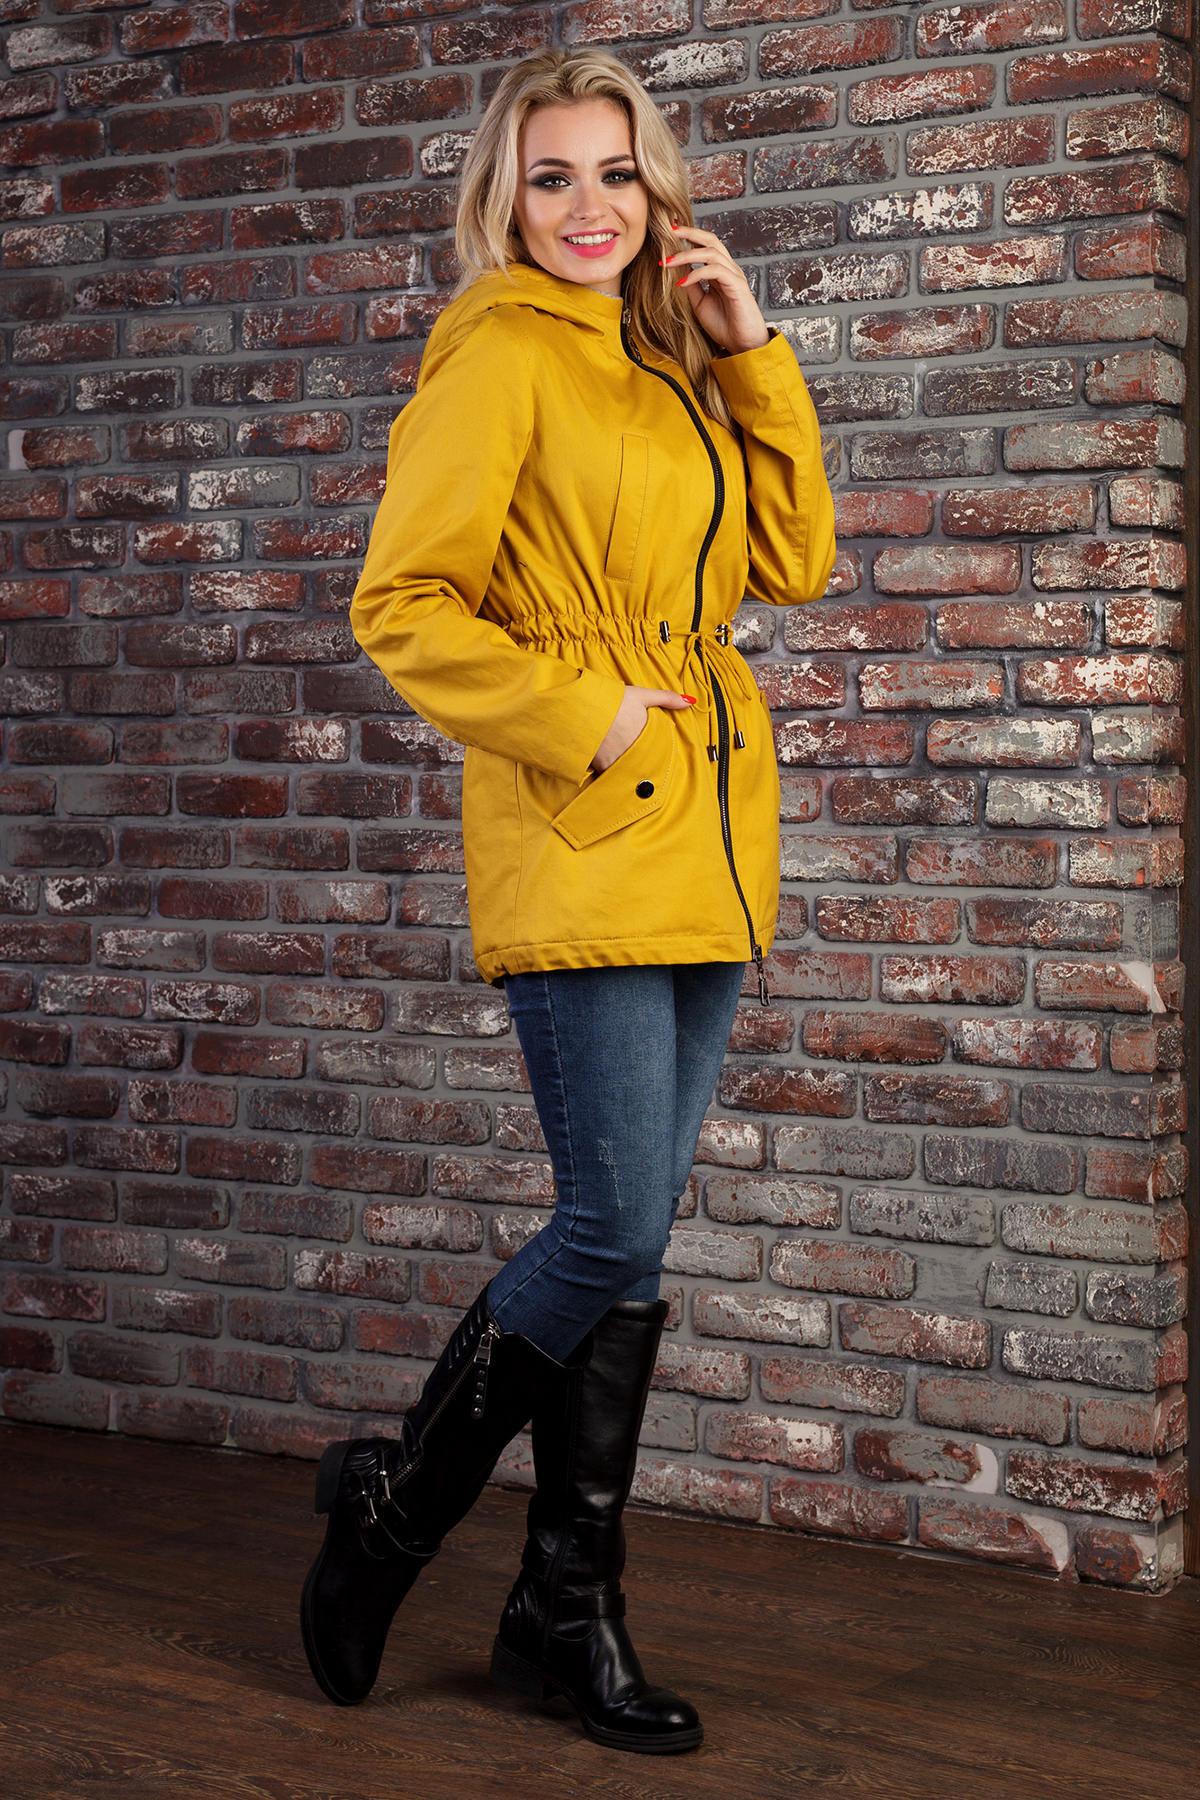 Парка весна-осень Салем 1465 АРТ. 9064 Цвет: Горчица/серый - фото 2, интернет магазин tm-modus.ru